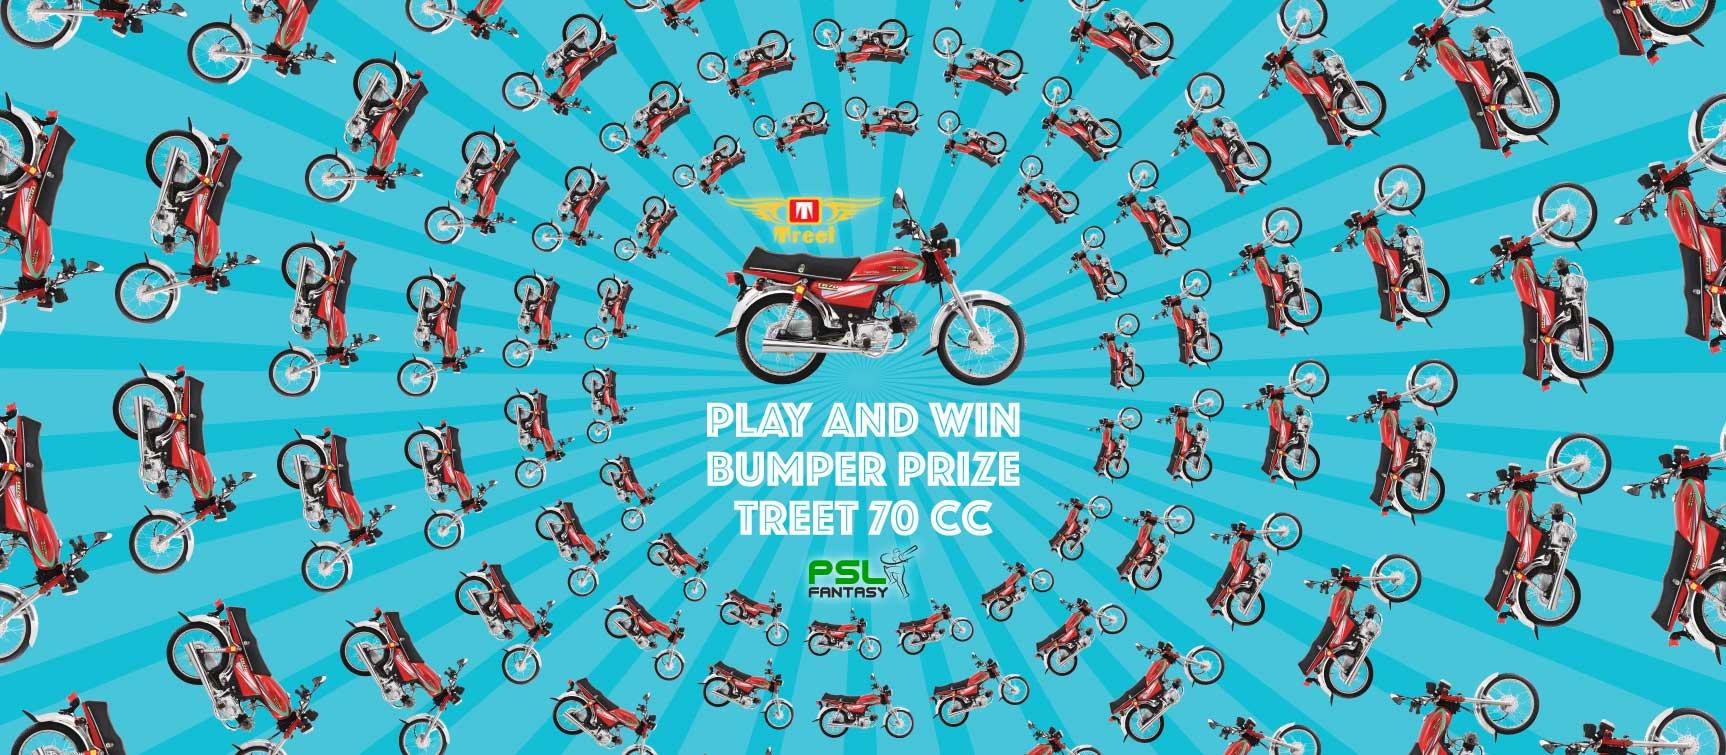 Treet bike prize